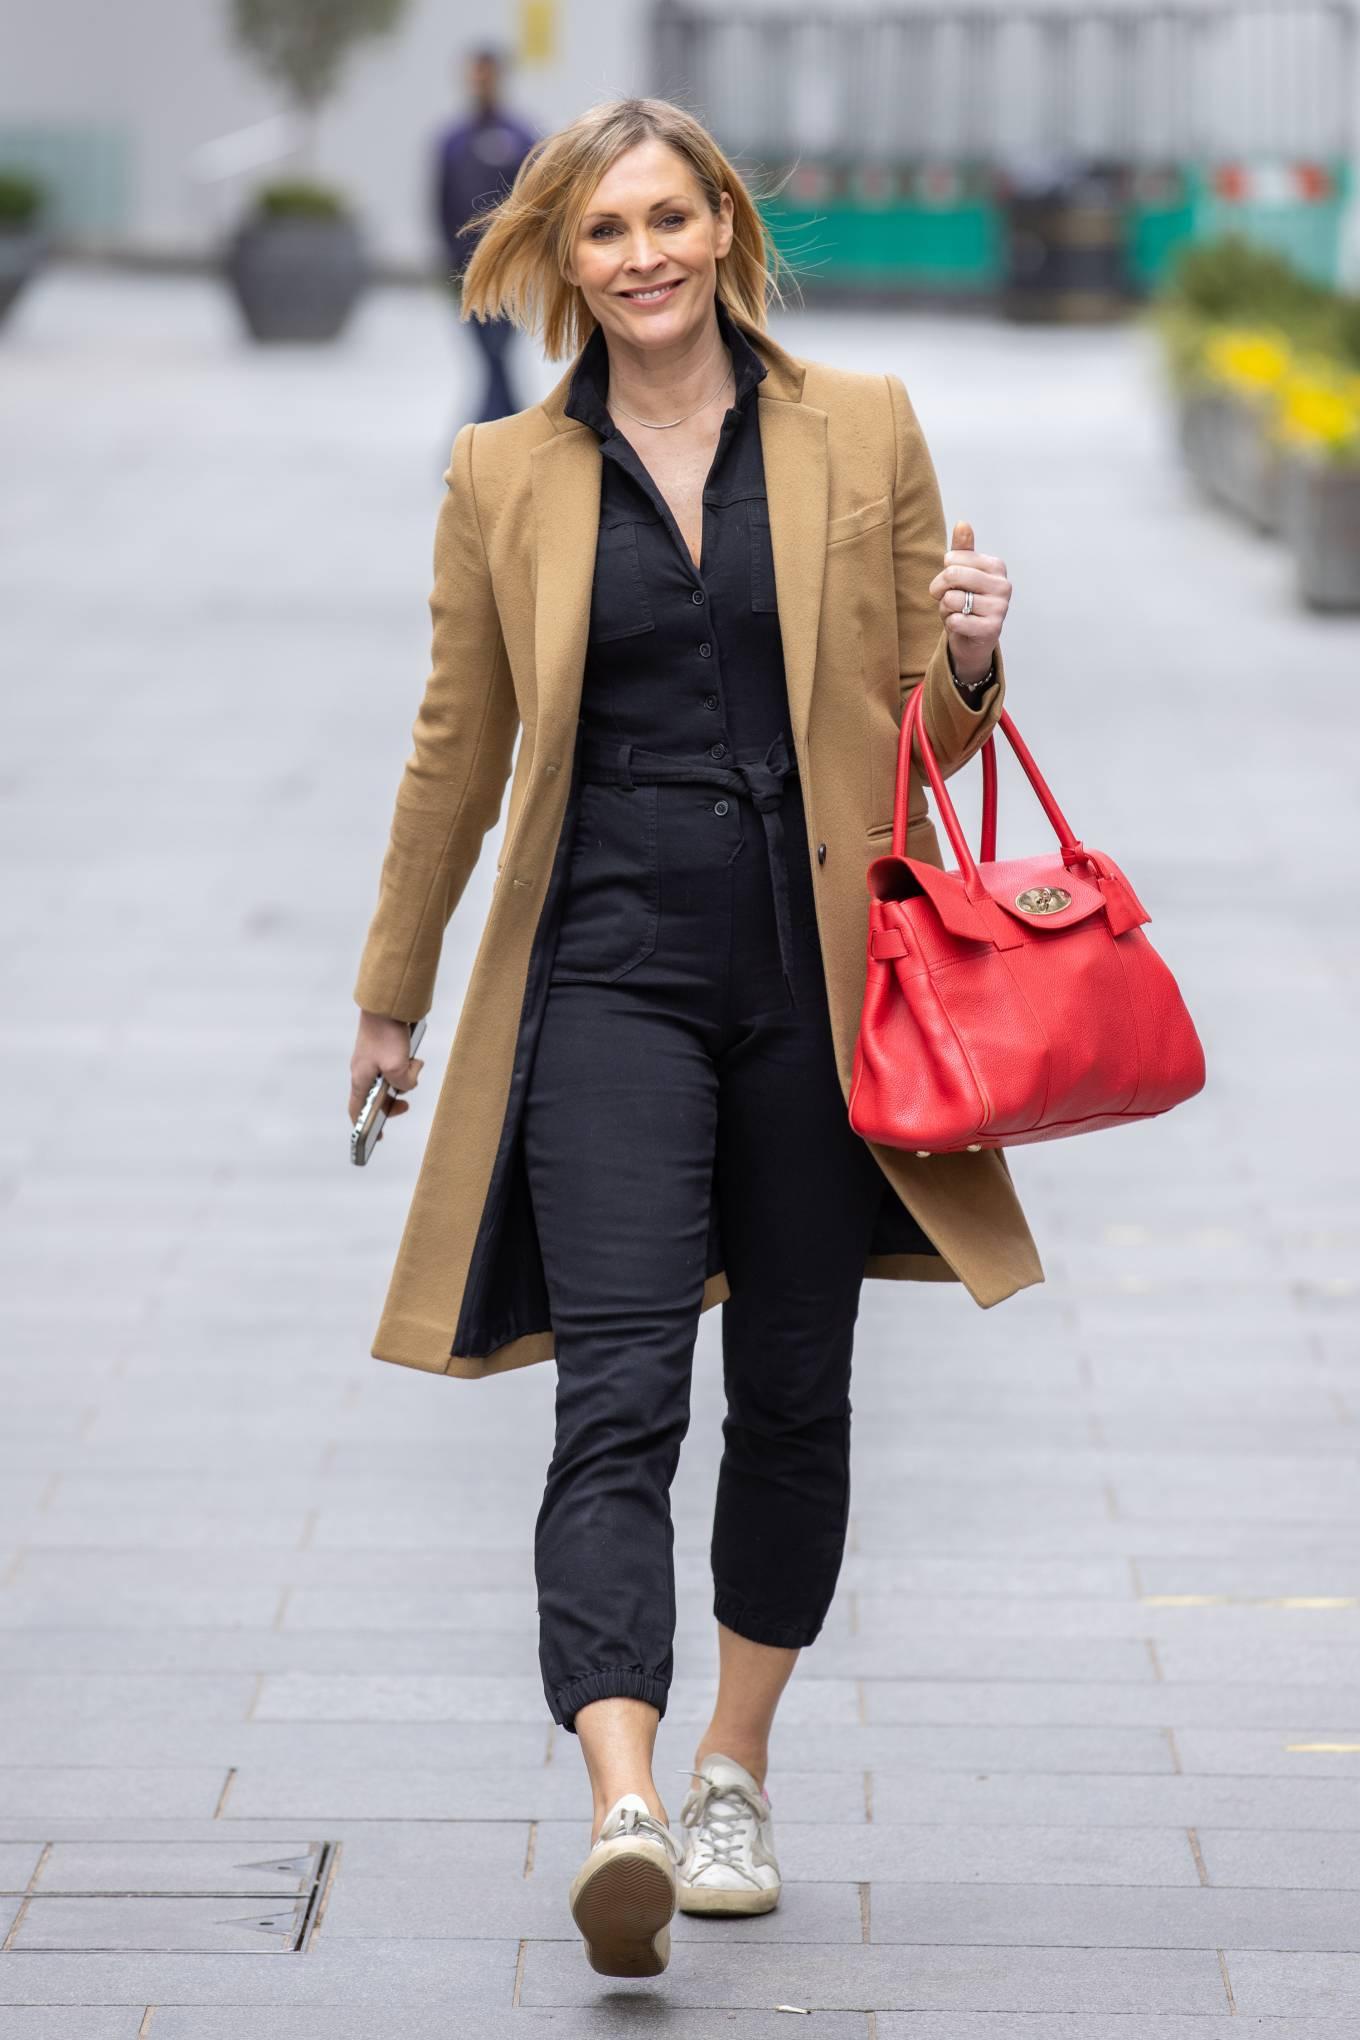 Jenni Falconer 2021 : Jenni Falconer – Seen after radio show in London-06